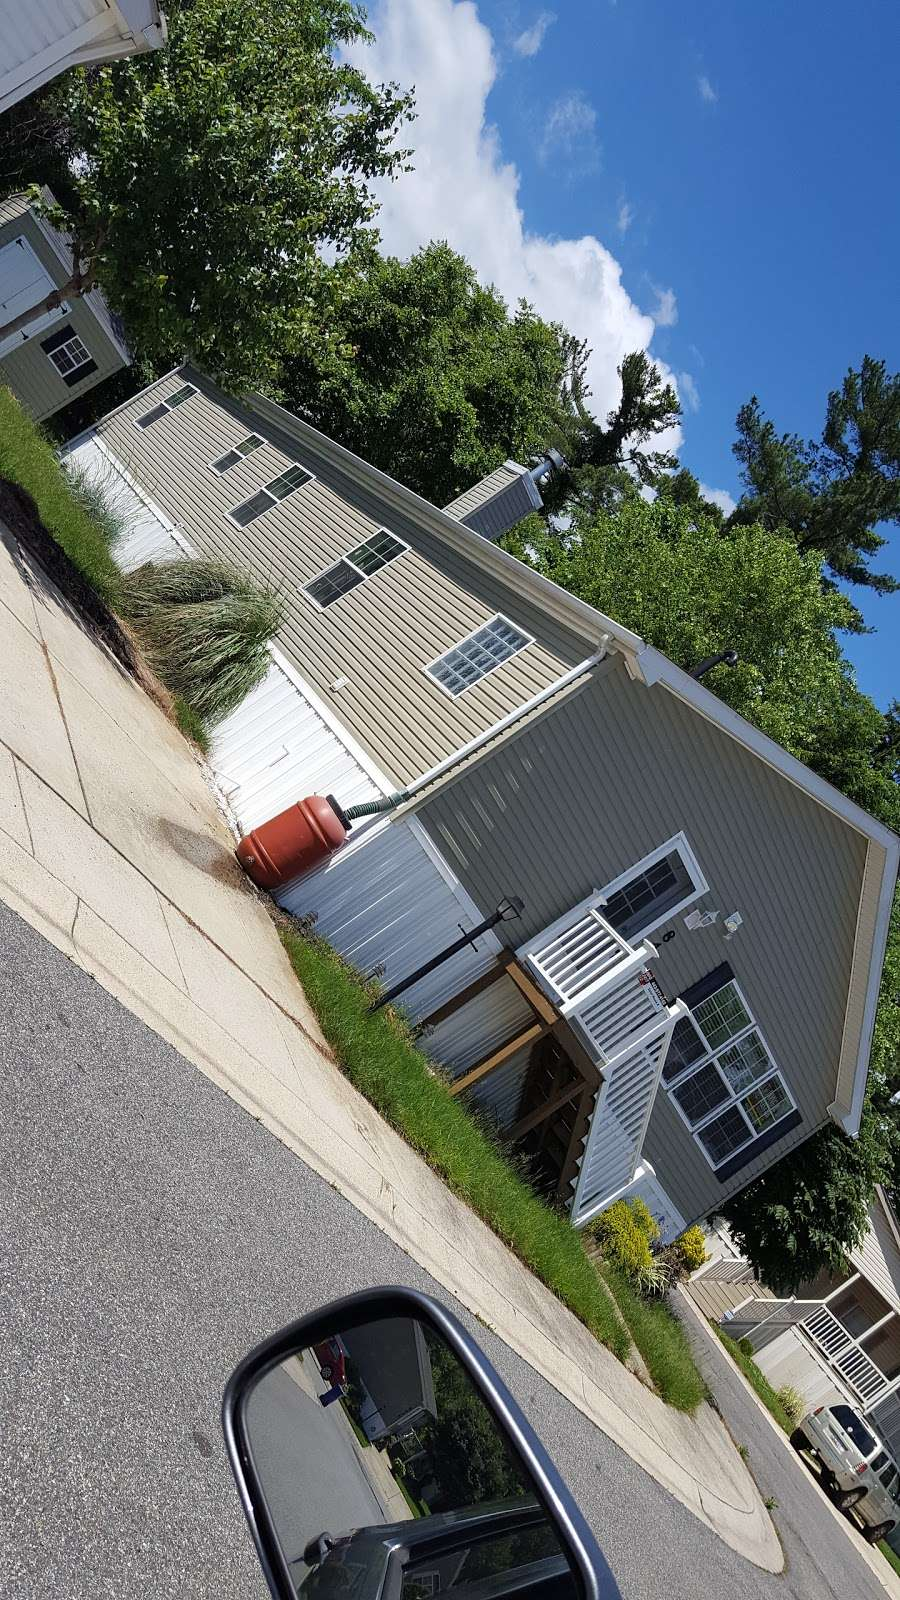 Brentwood Manor Inc - rv park    Photo 2 of 5   Address: 8291 Washington Blvd, Jessup, MD 20794, USA   Phone: (301) 498-0440